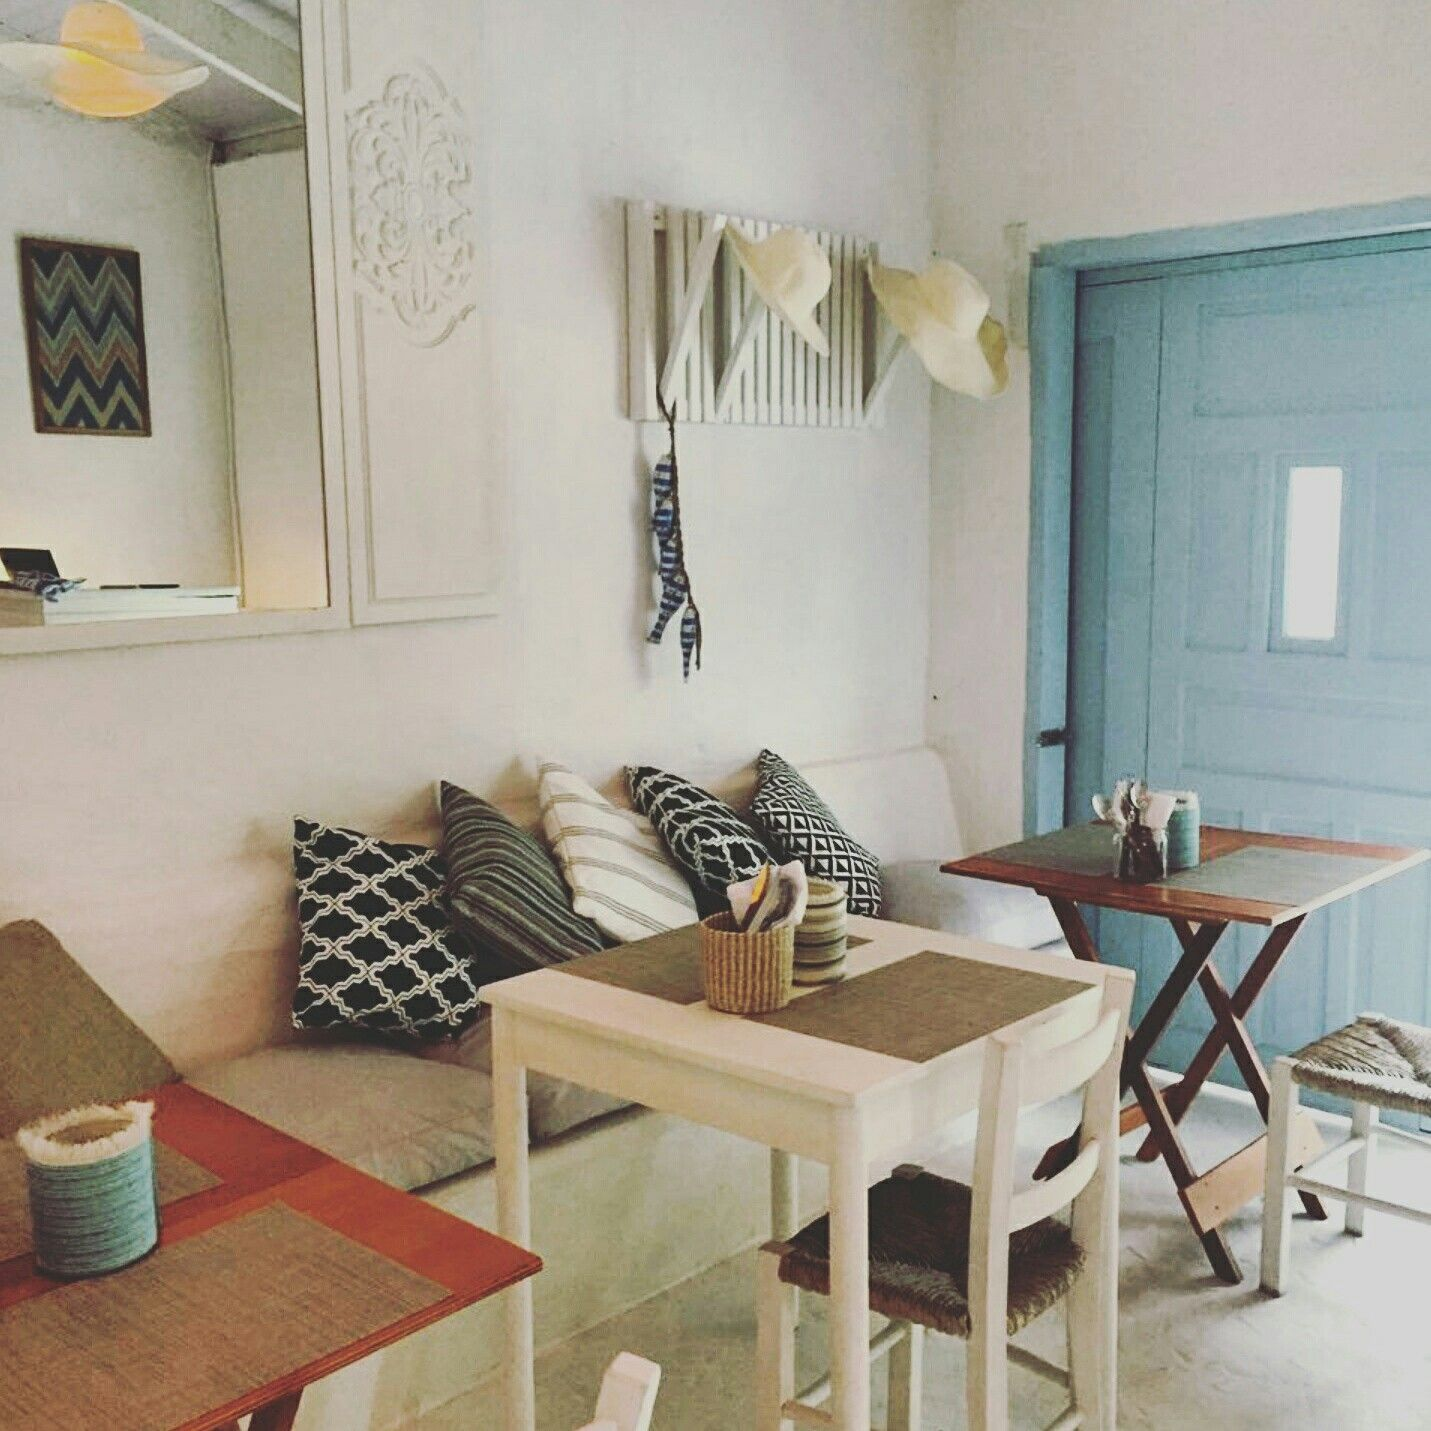 1940s Mission Style House Gets Brilliant Transformation In: Pin De Galeria Ela Garimpô Em Lambisgoia Bar Ilhabela